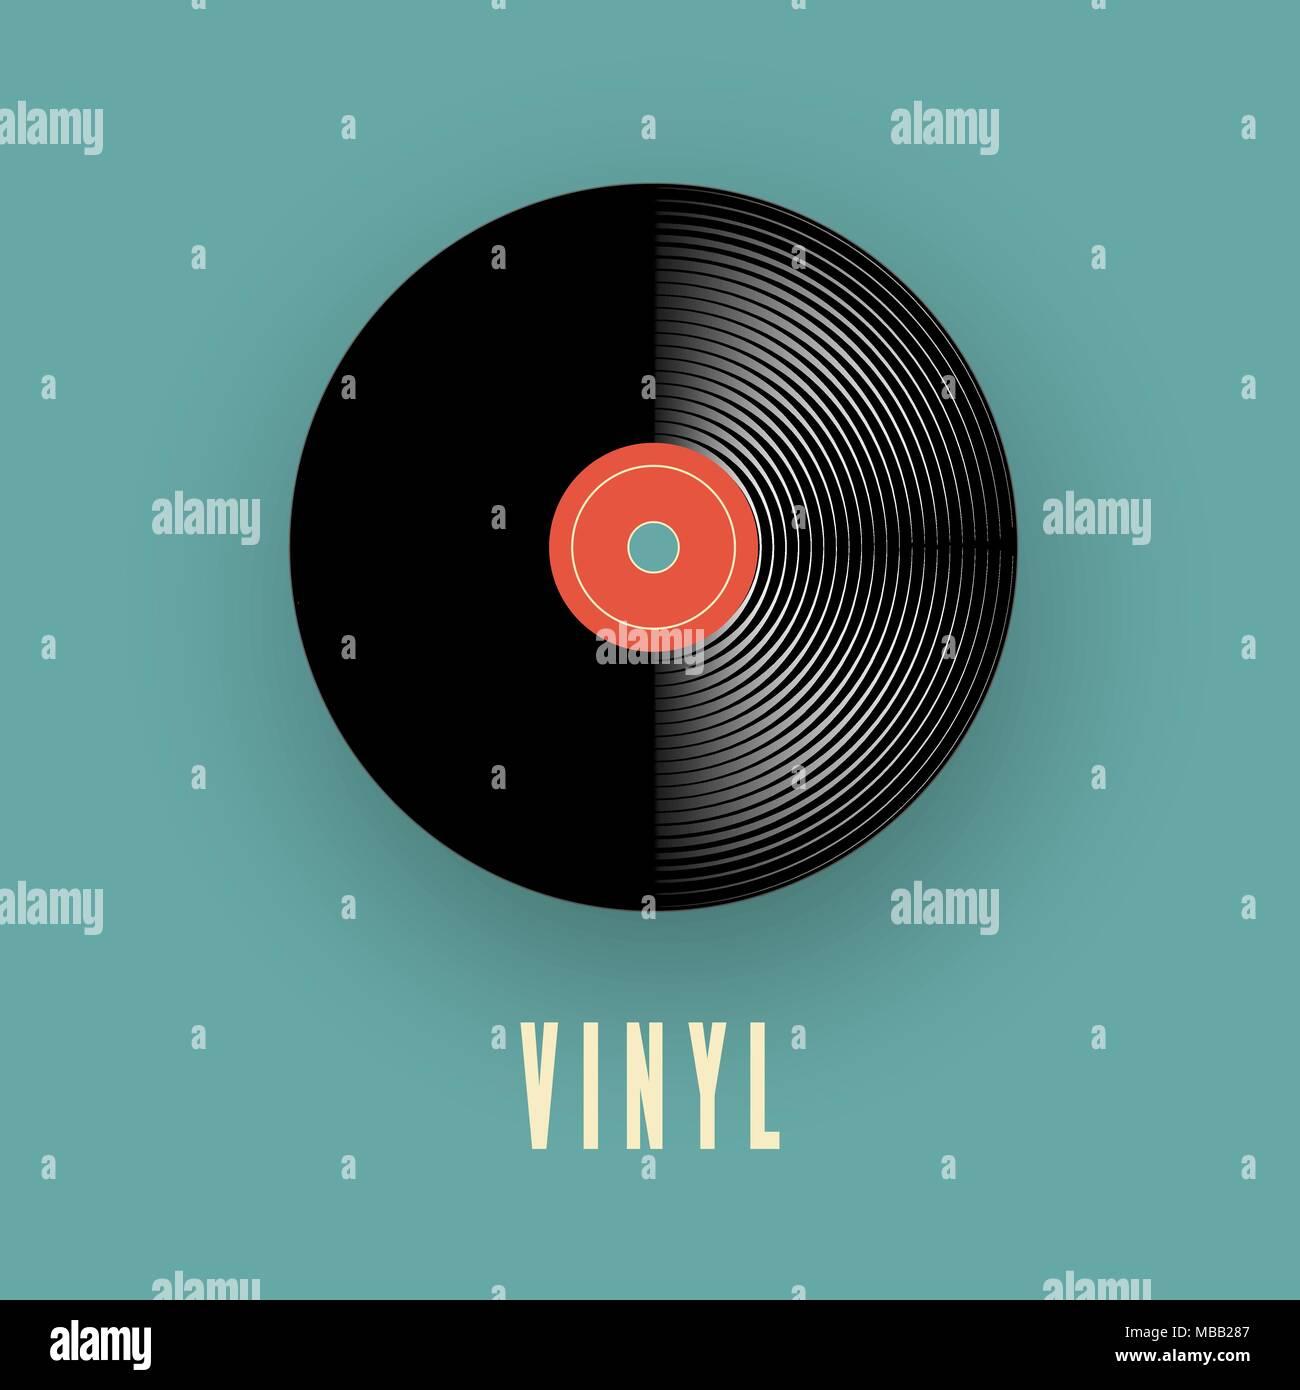 vinyl music record old vintage gramophone record vector illustration stock vector image art alamy https www alamy com vinyl music record old vintage gramophone record vector illustration image179108167 html